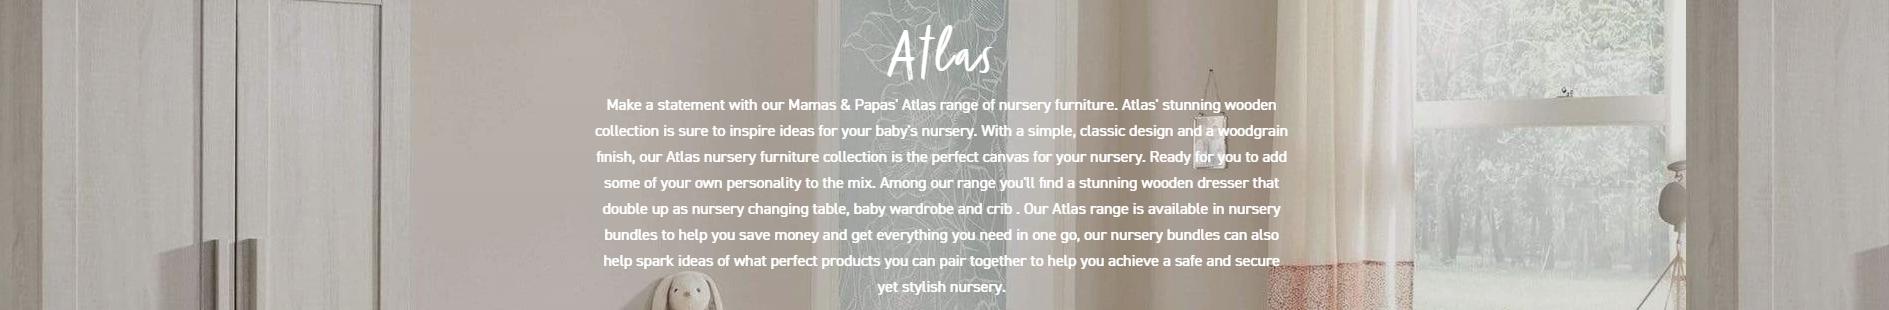 Atlas kolekcija